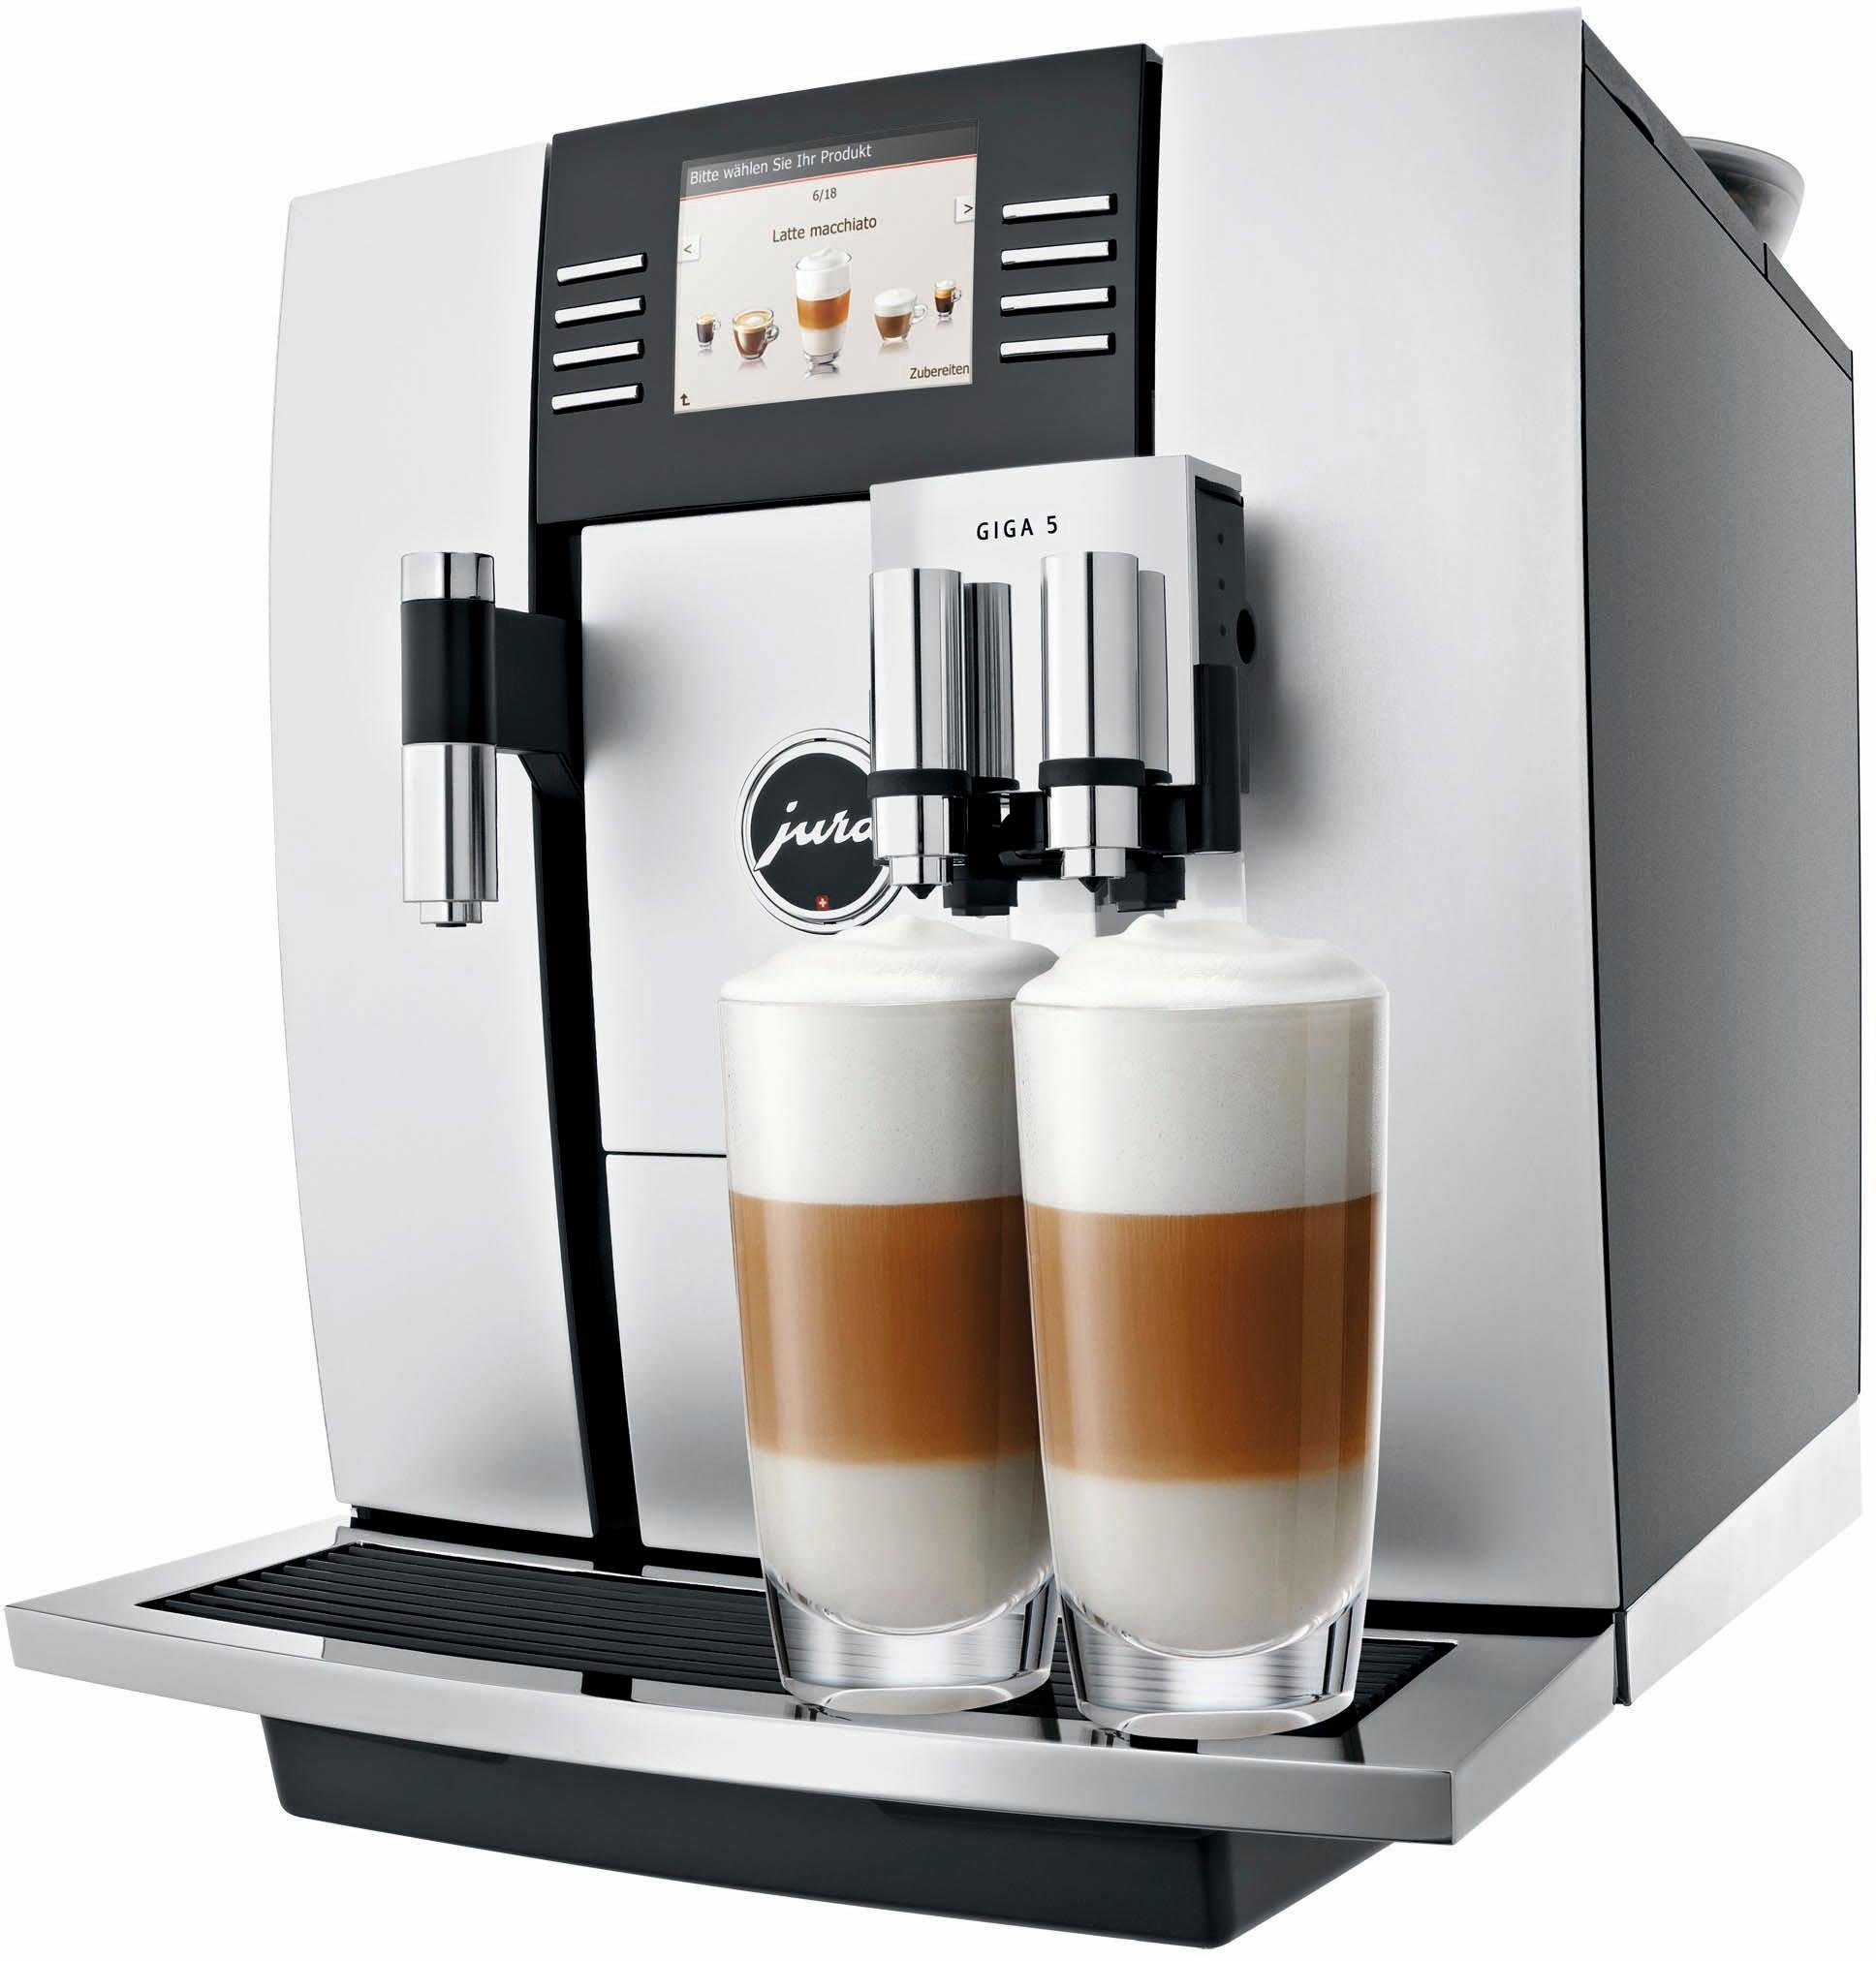 Jura Kaffeevollautomat 13583 GIGA 5, 2,6l Tank, Scheibenmahlwerk, 2 Mahlwerke